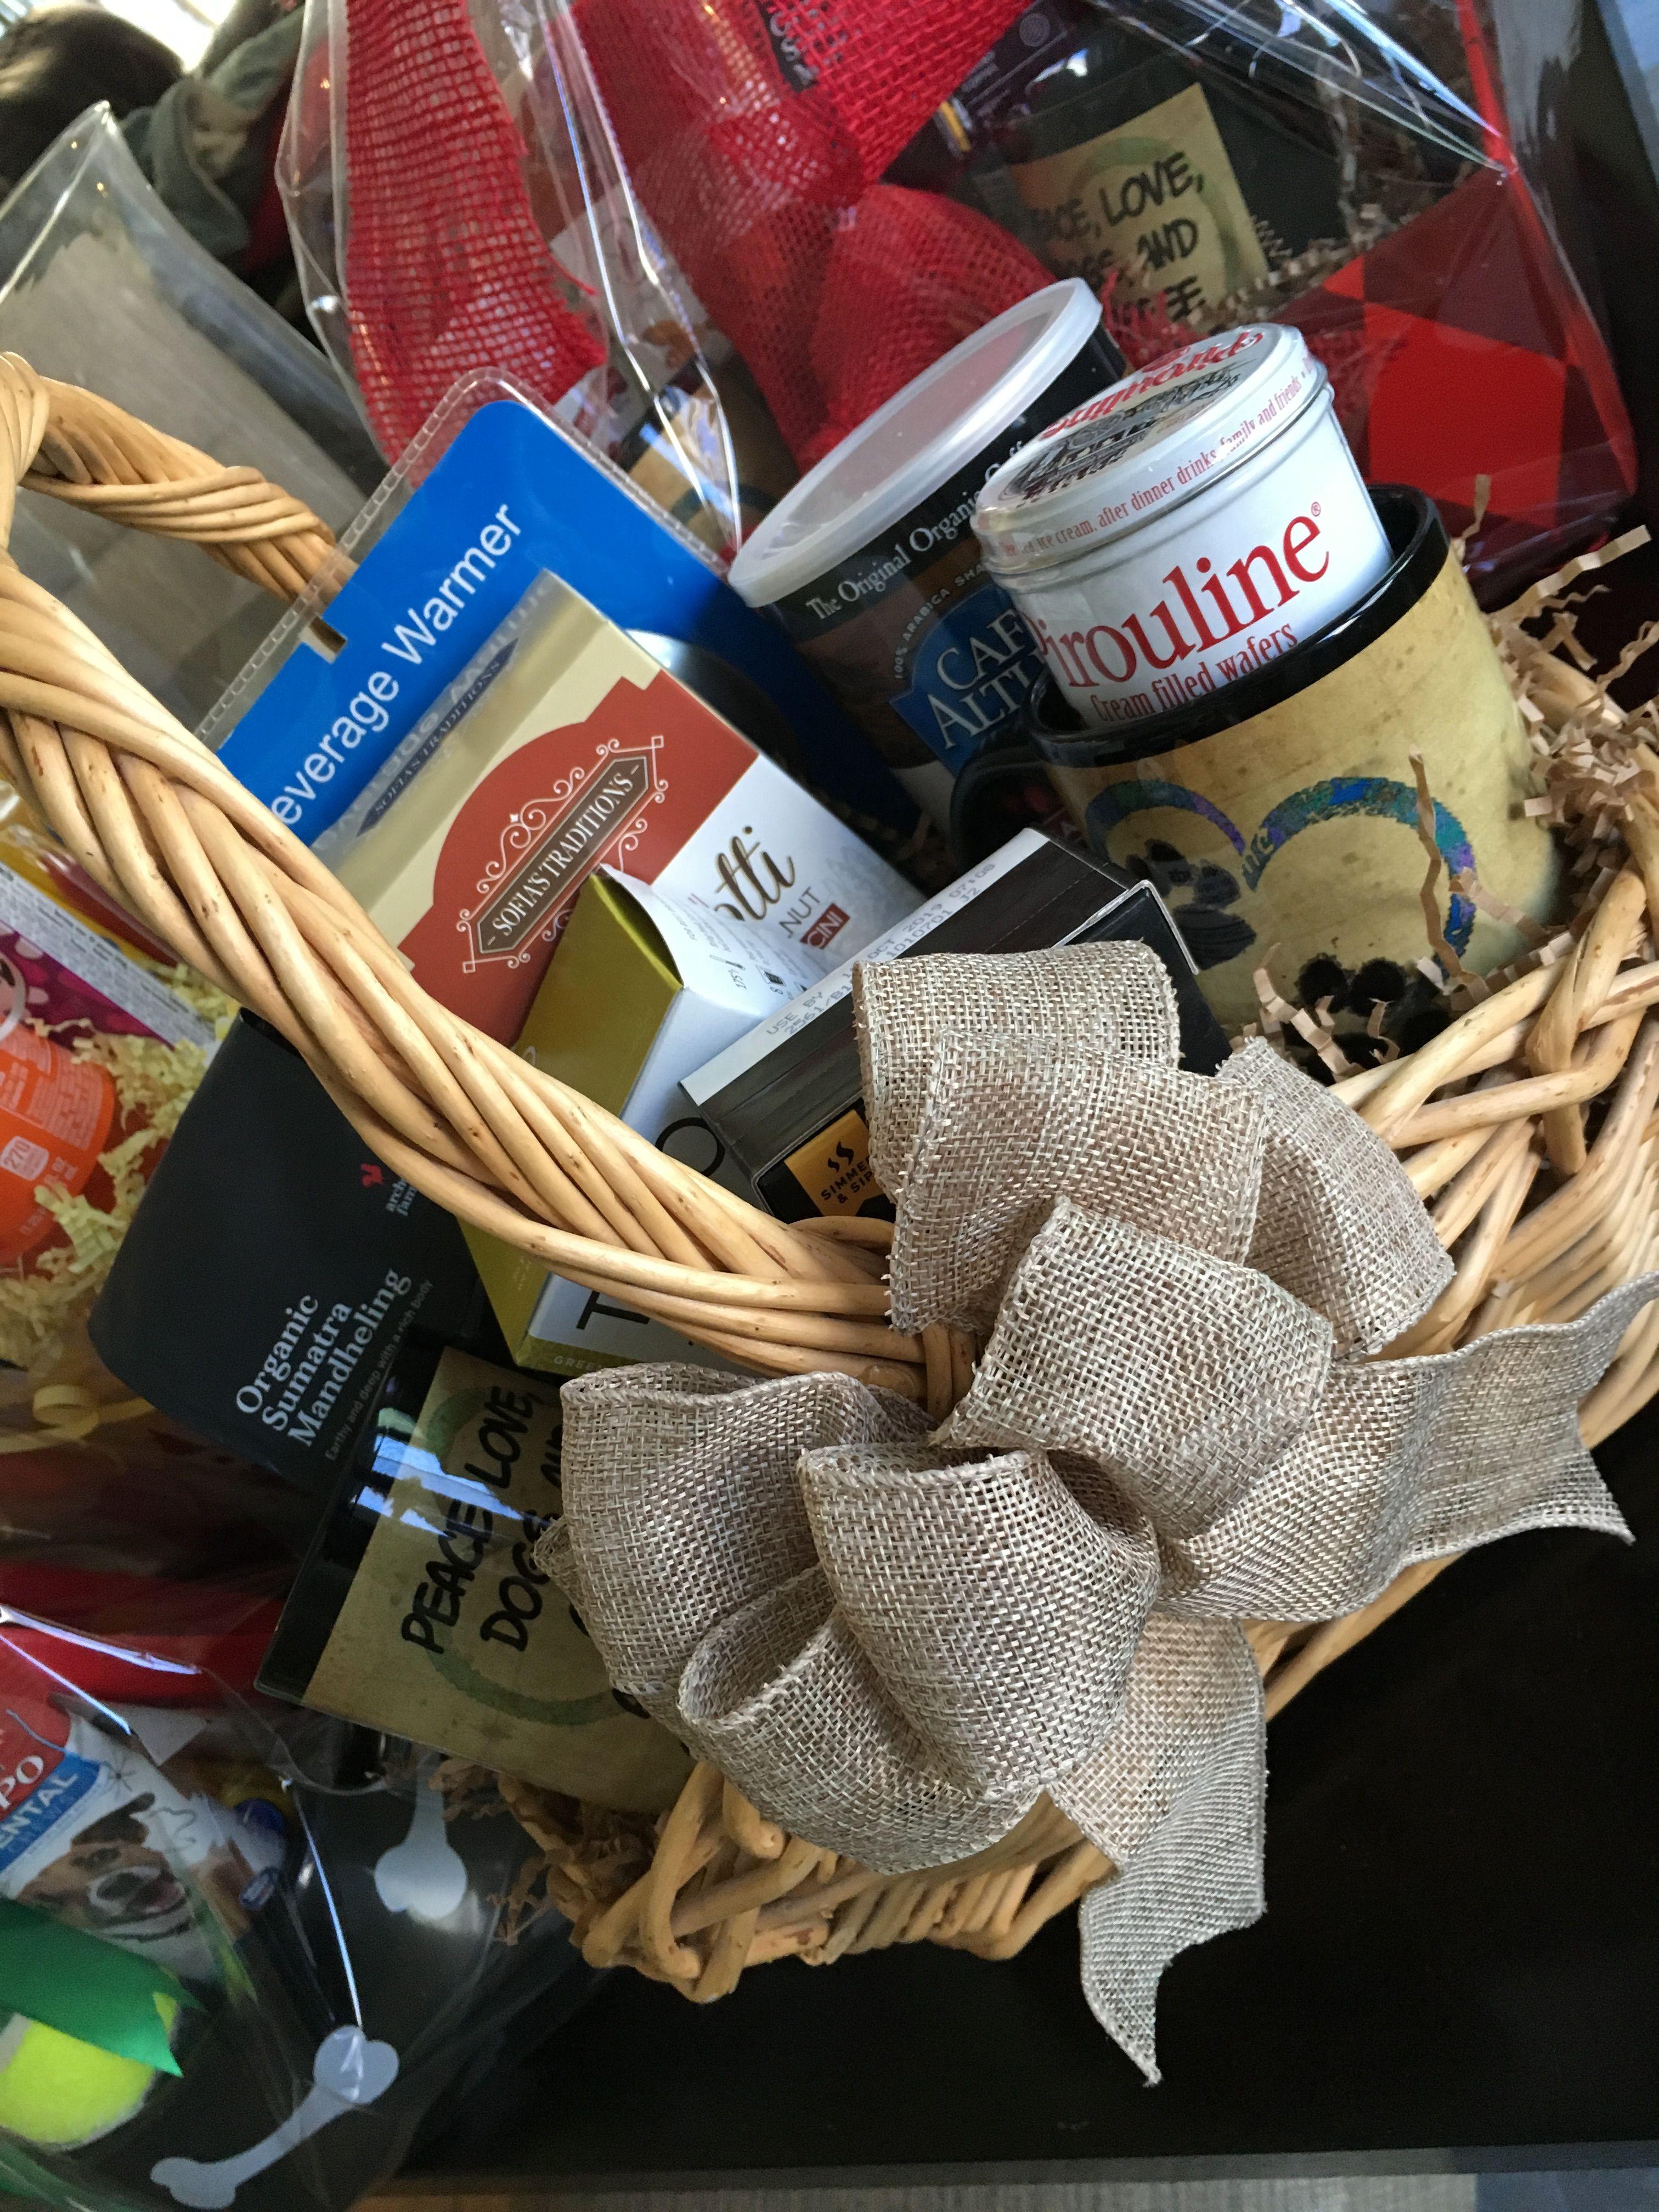 Image by novel designs on custom theme gift baskets